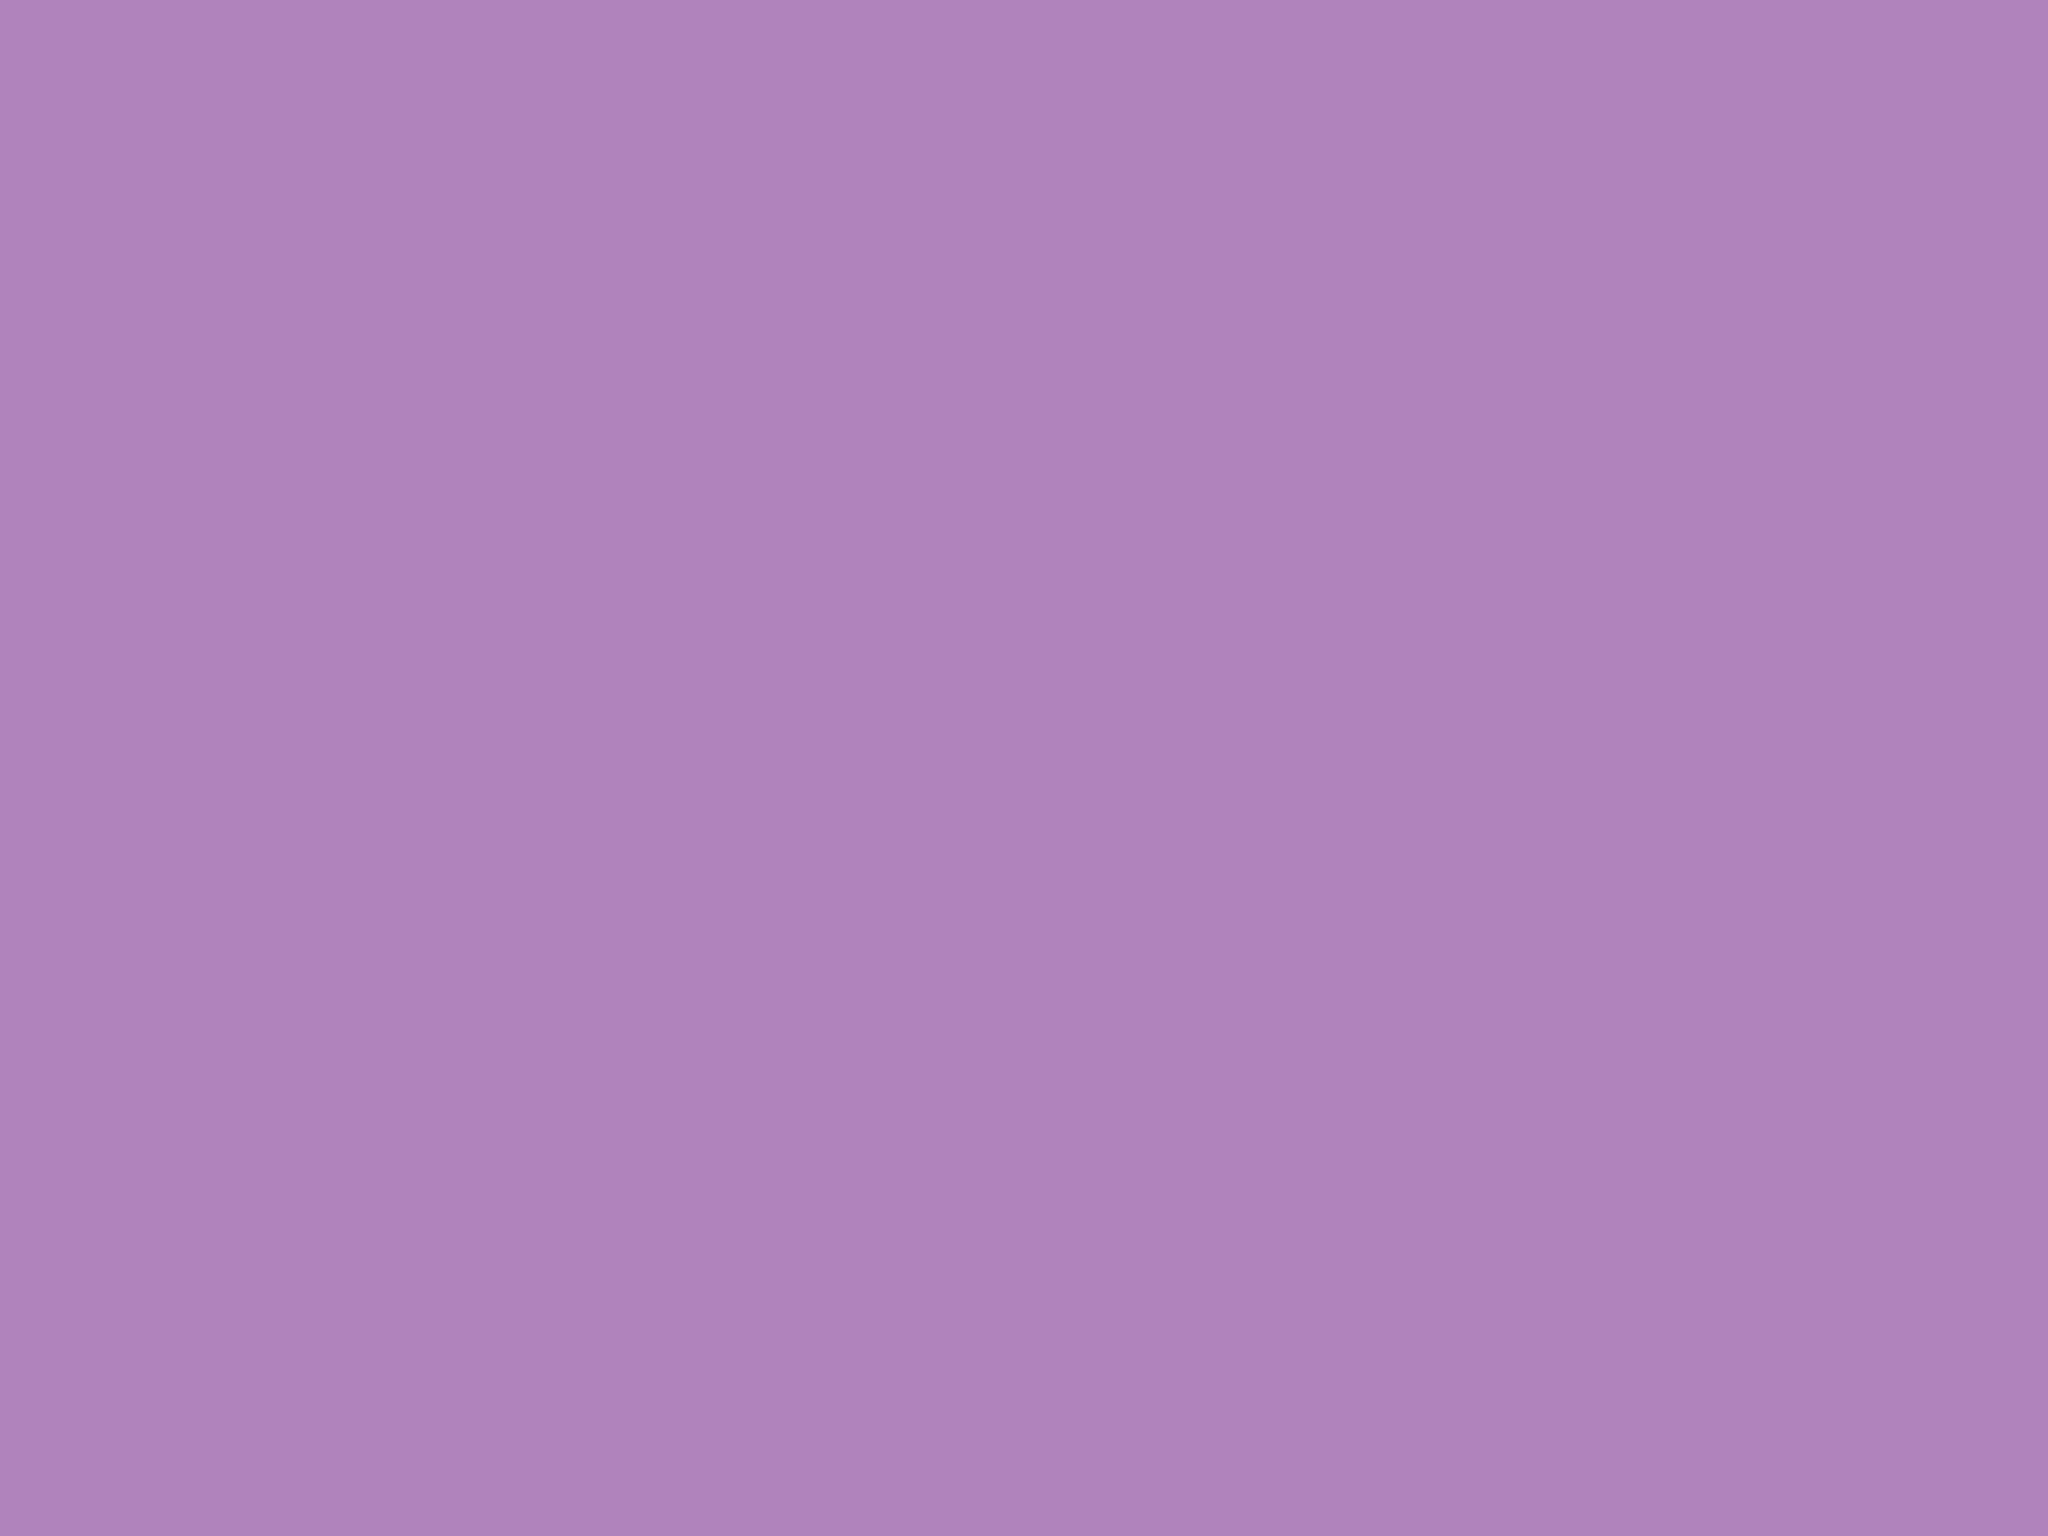 2048x1536 African Violet Solid Color Background